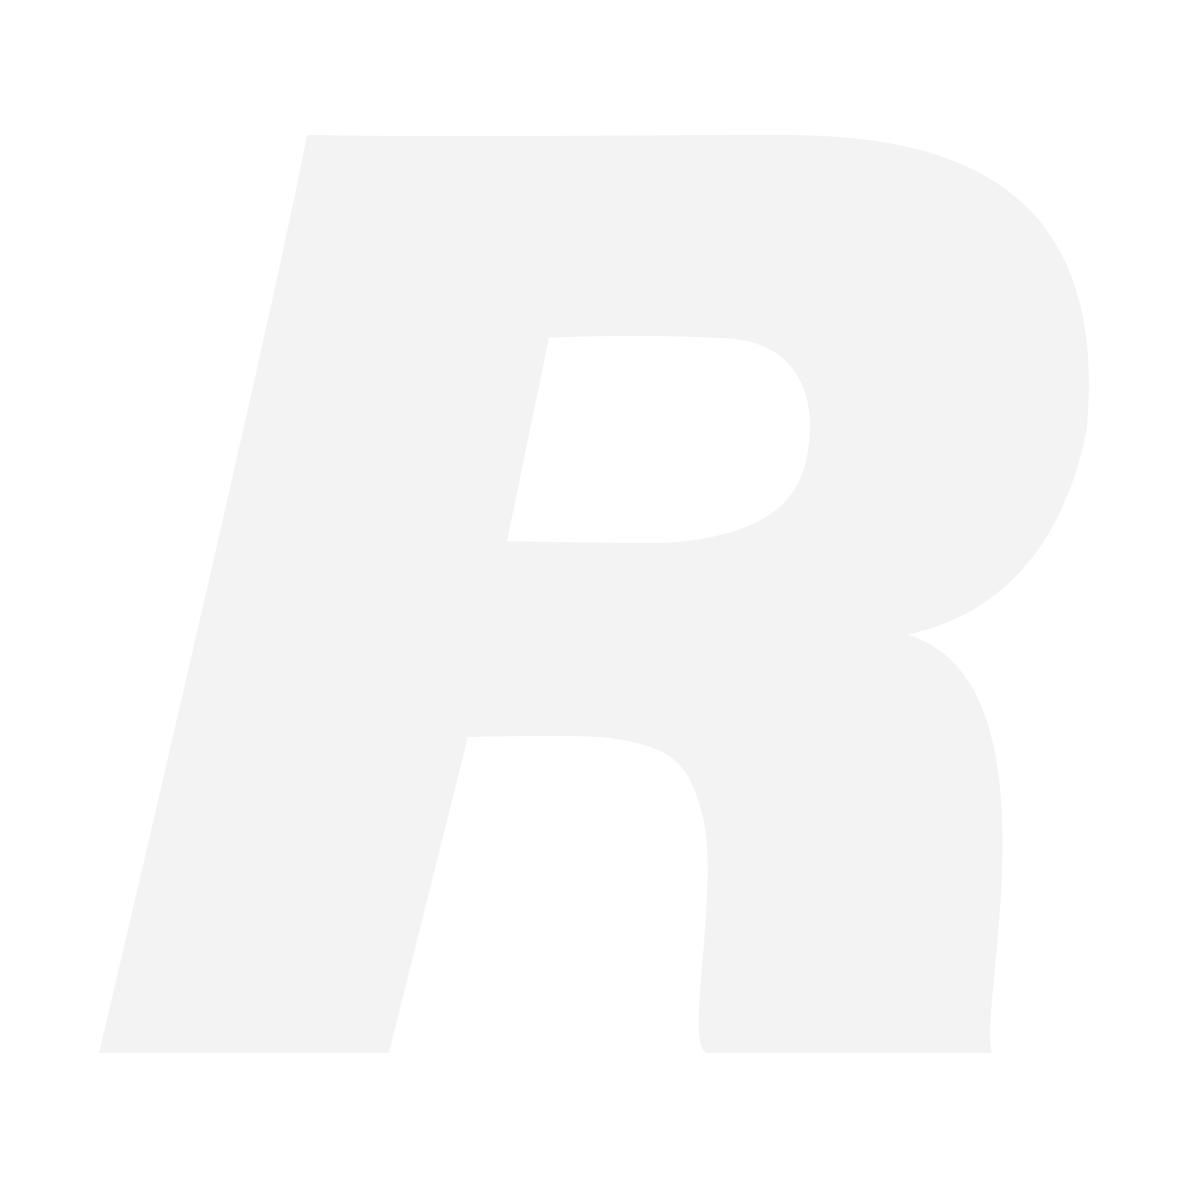 LEICA TRI-ELMAR-M 16-18-21MM 1:4 ASPH + 12011 ETSIN KÄYTETTY